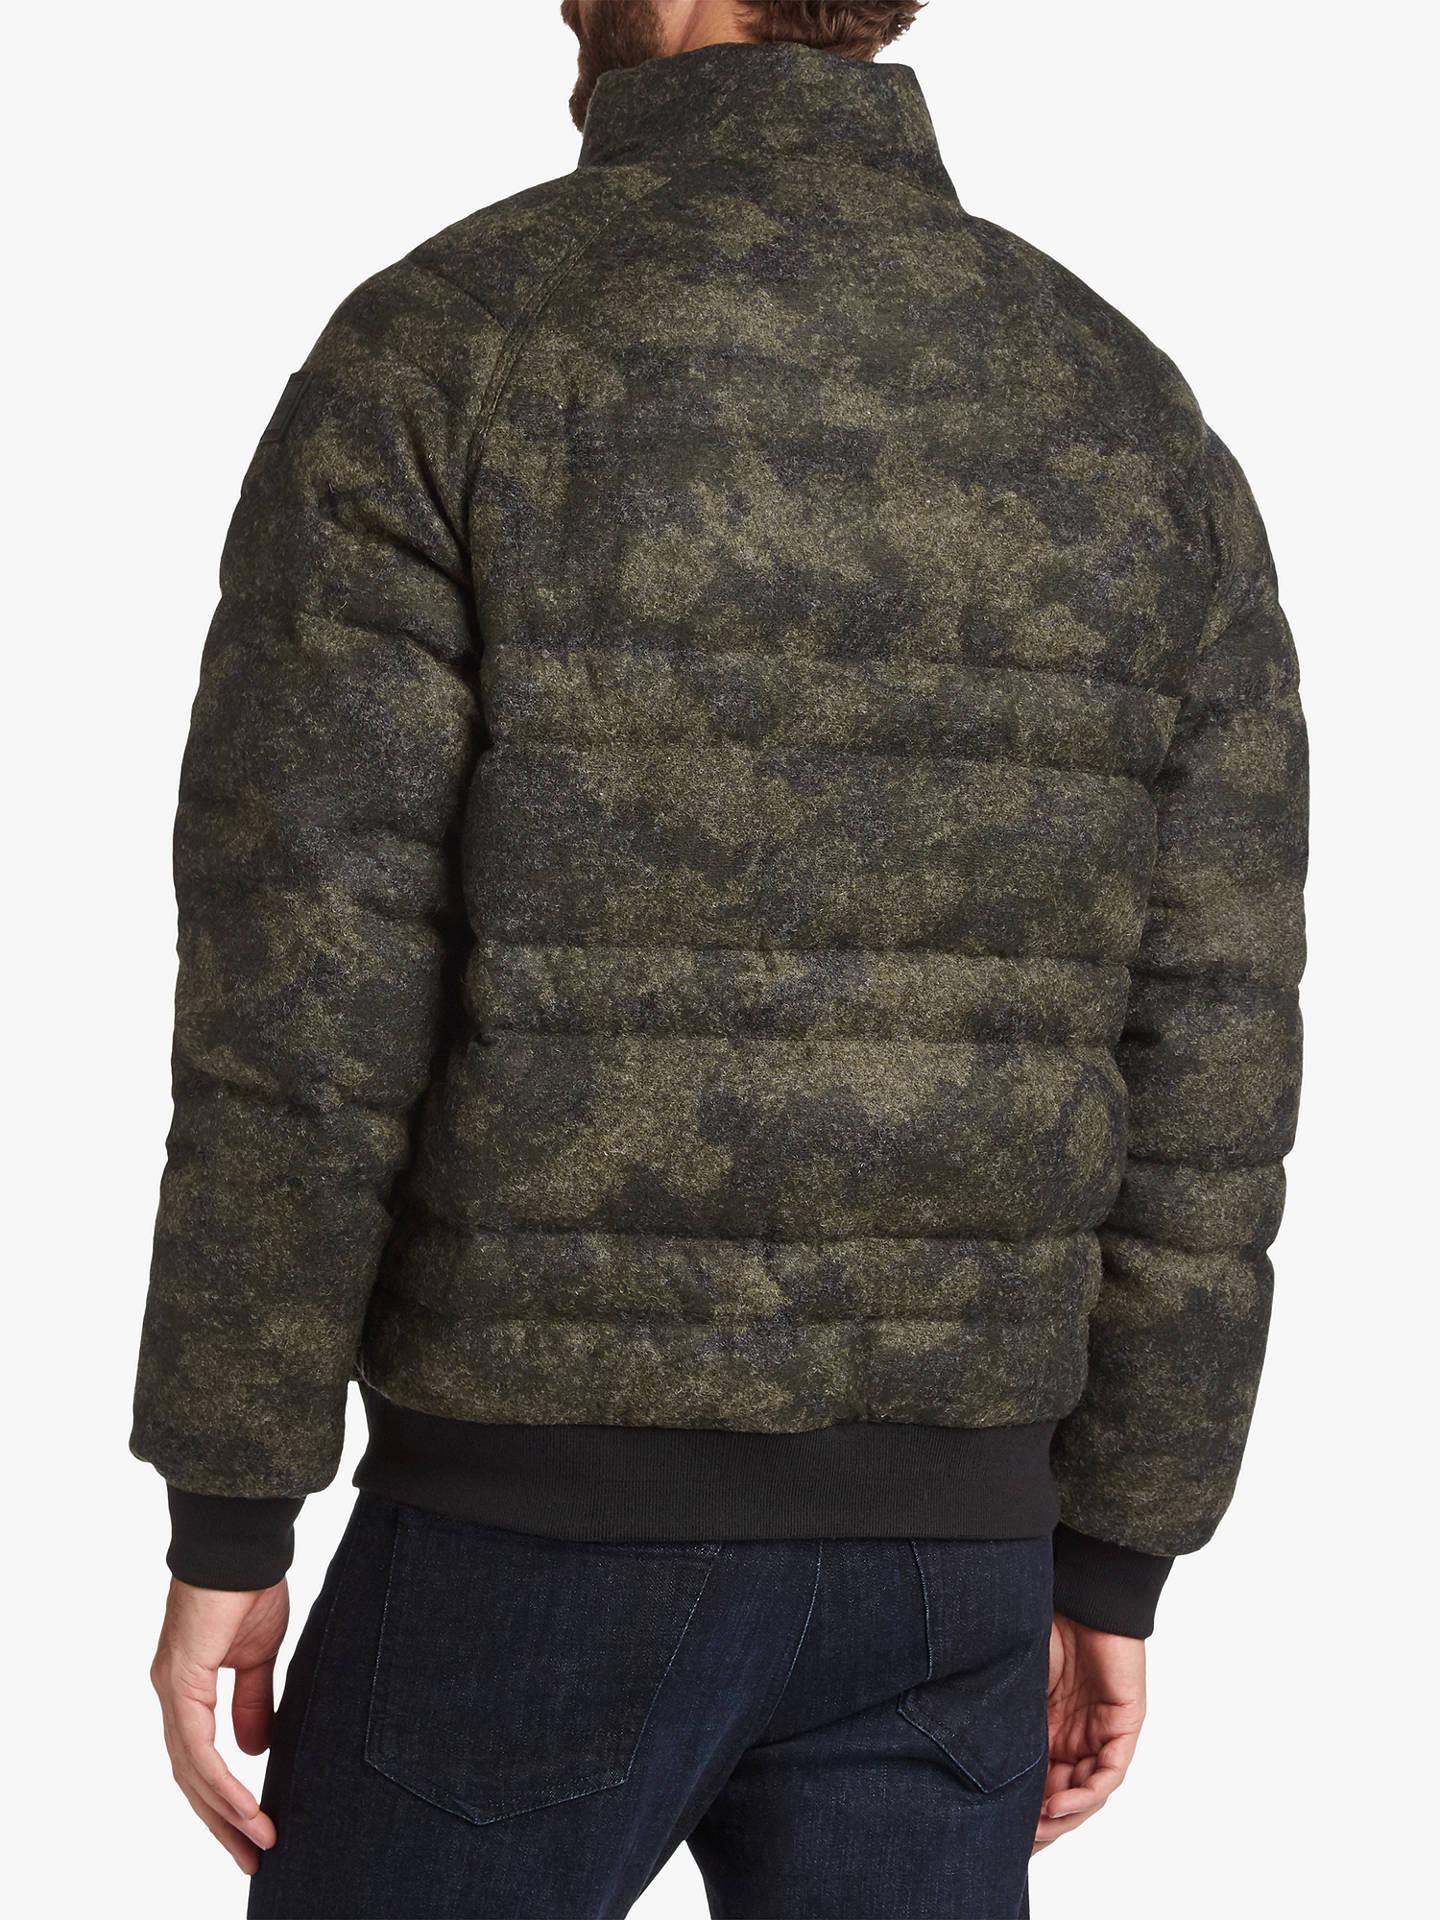 77c884e15 BOSS Ocamo Puffer Jacket, Dark Green at John Lewis & Partners